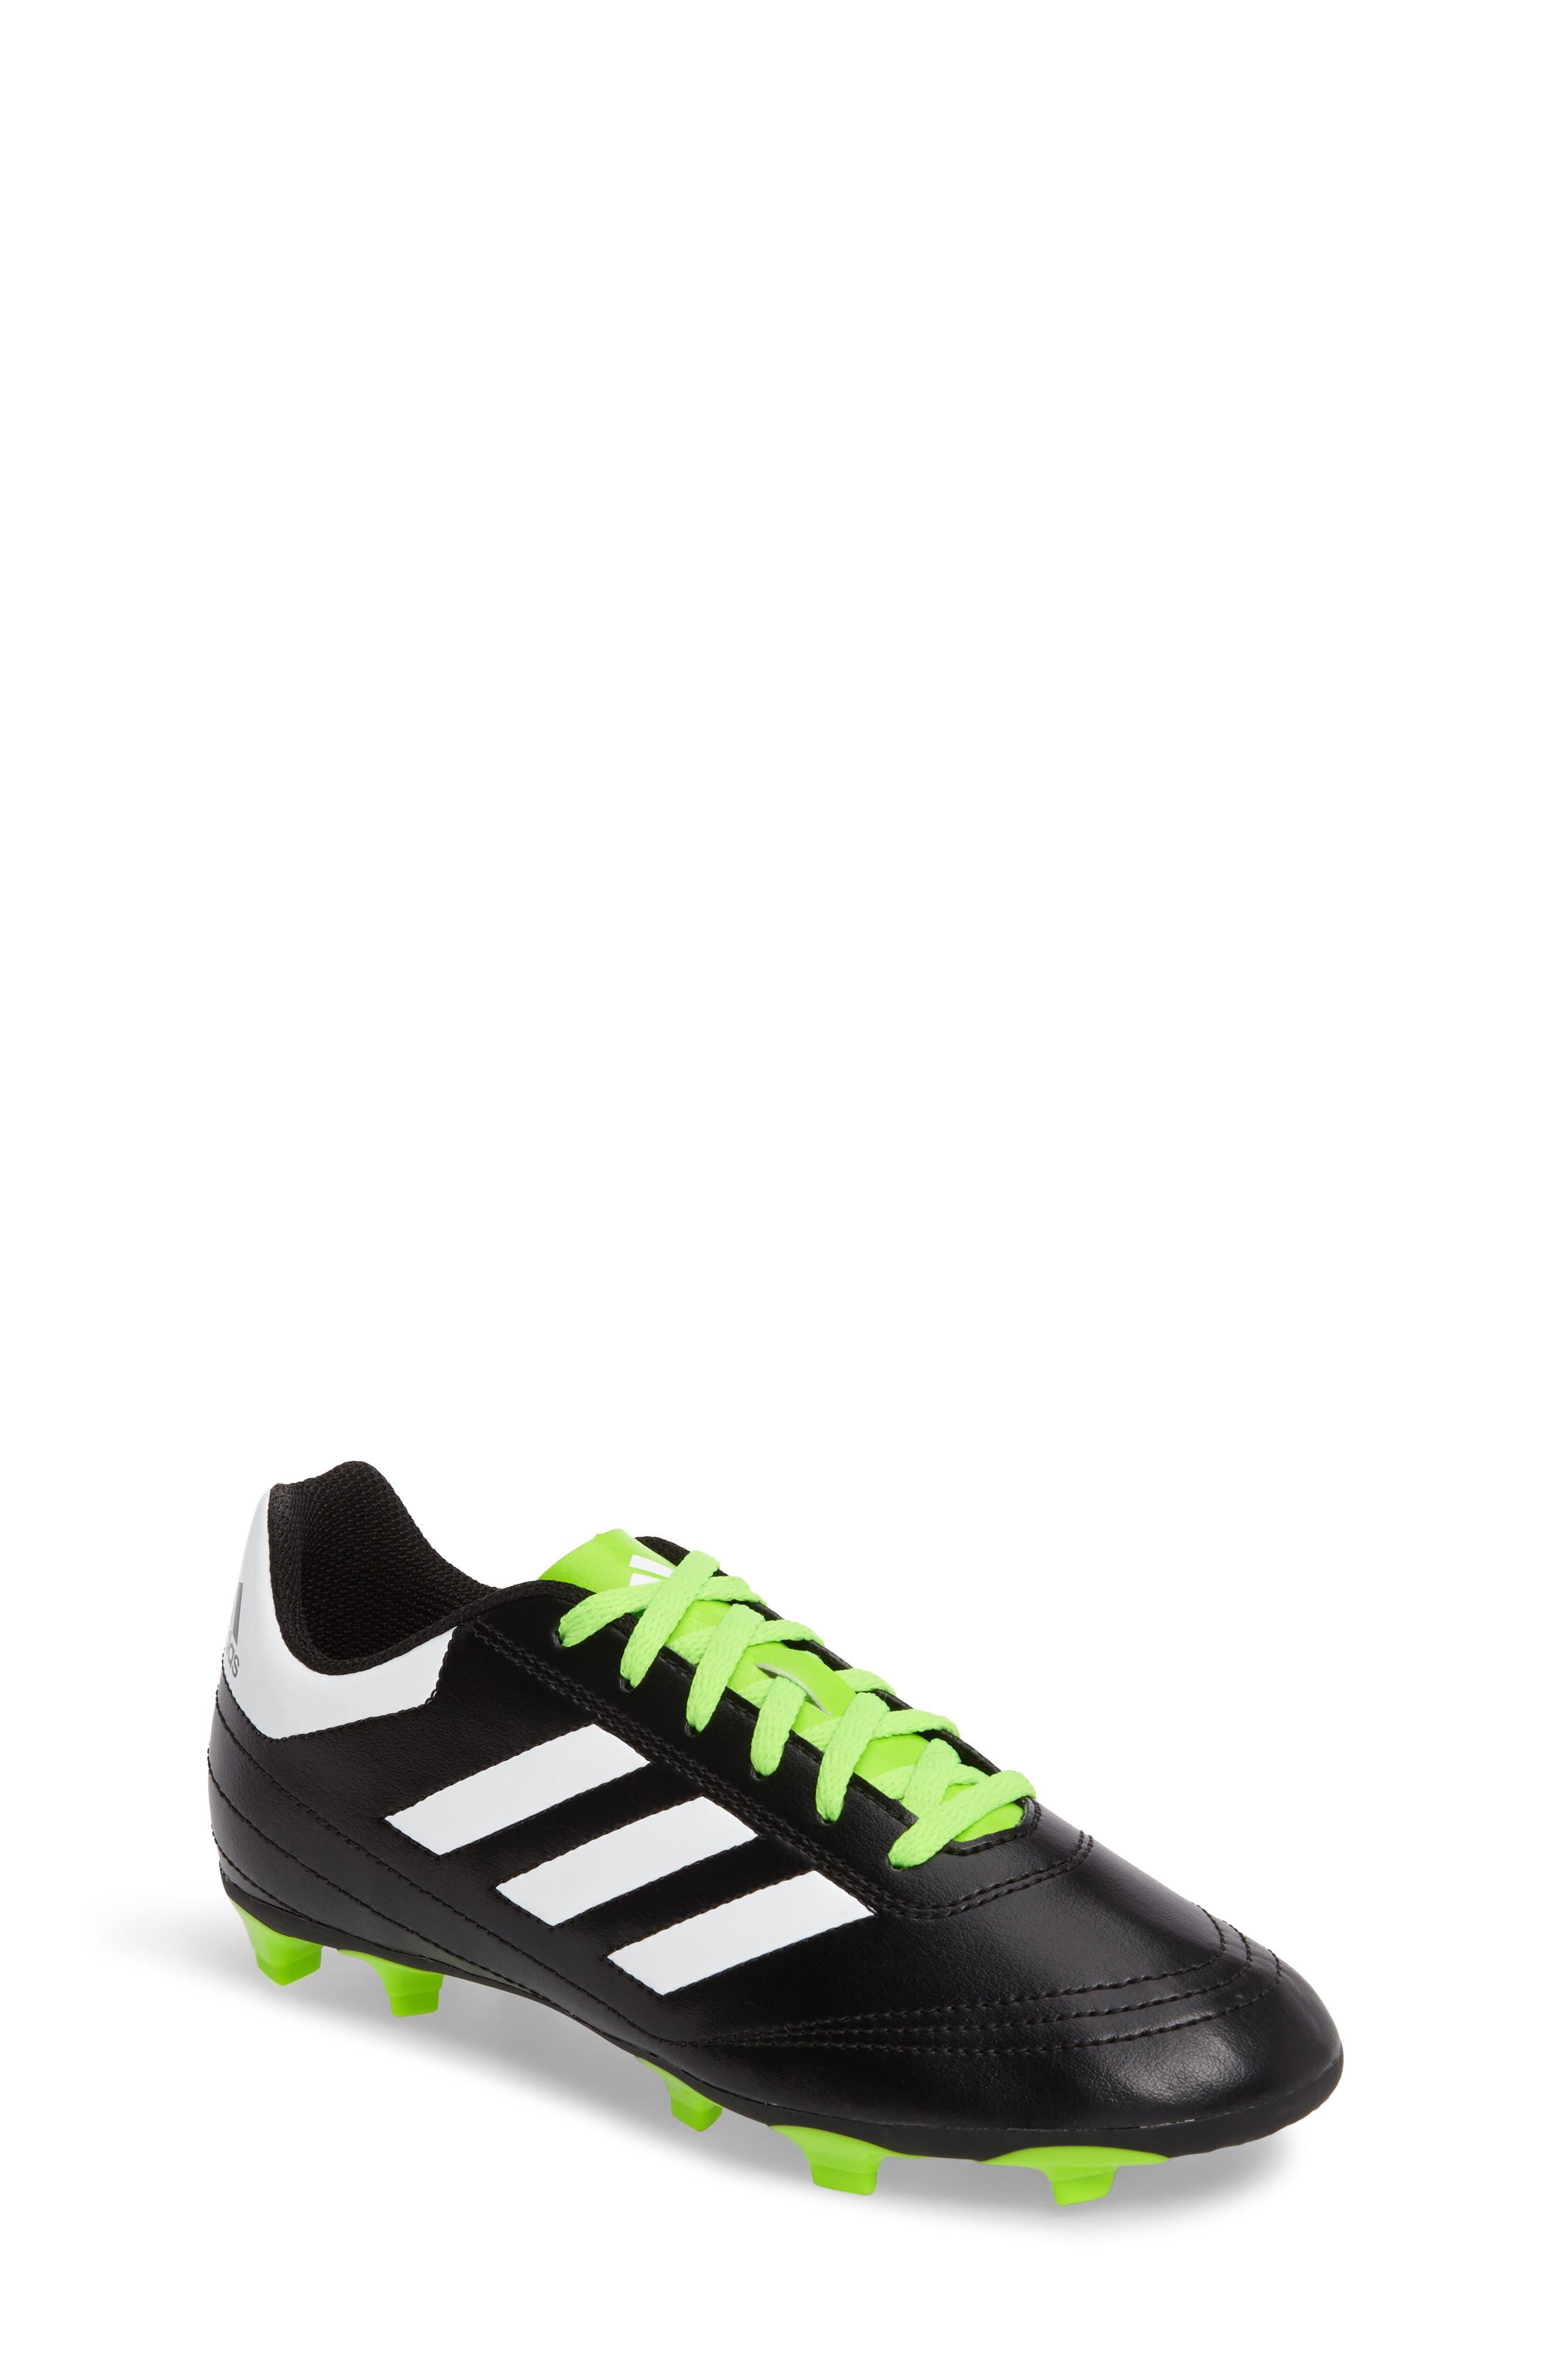 Main Image - adidas Goletto VI Soccer Shoe (Toddler, Little Kid & Big Kid)